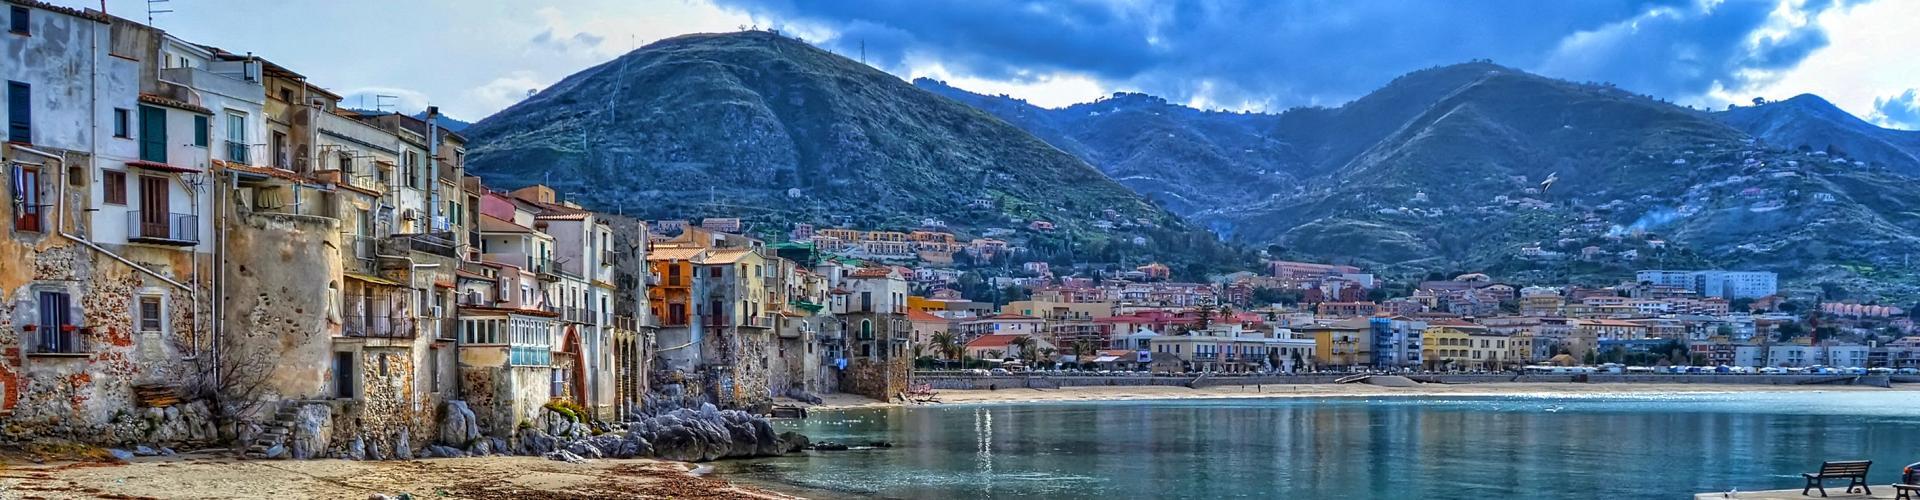 Gebeco Reisen Italien